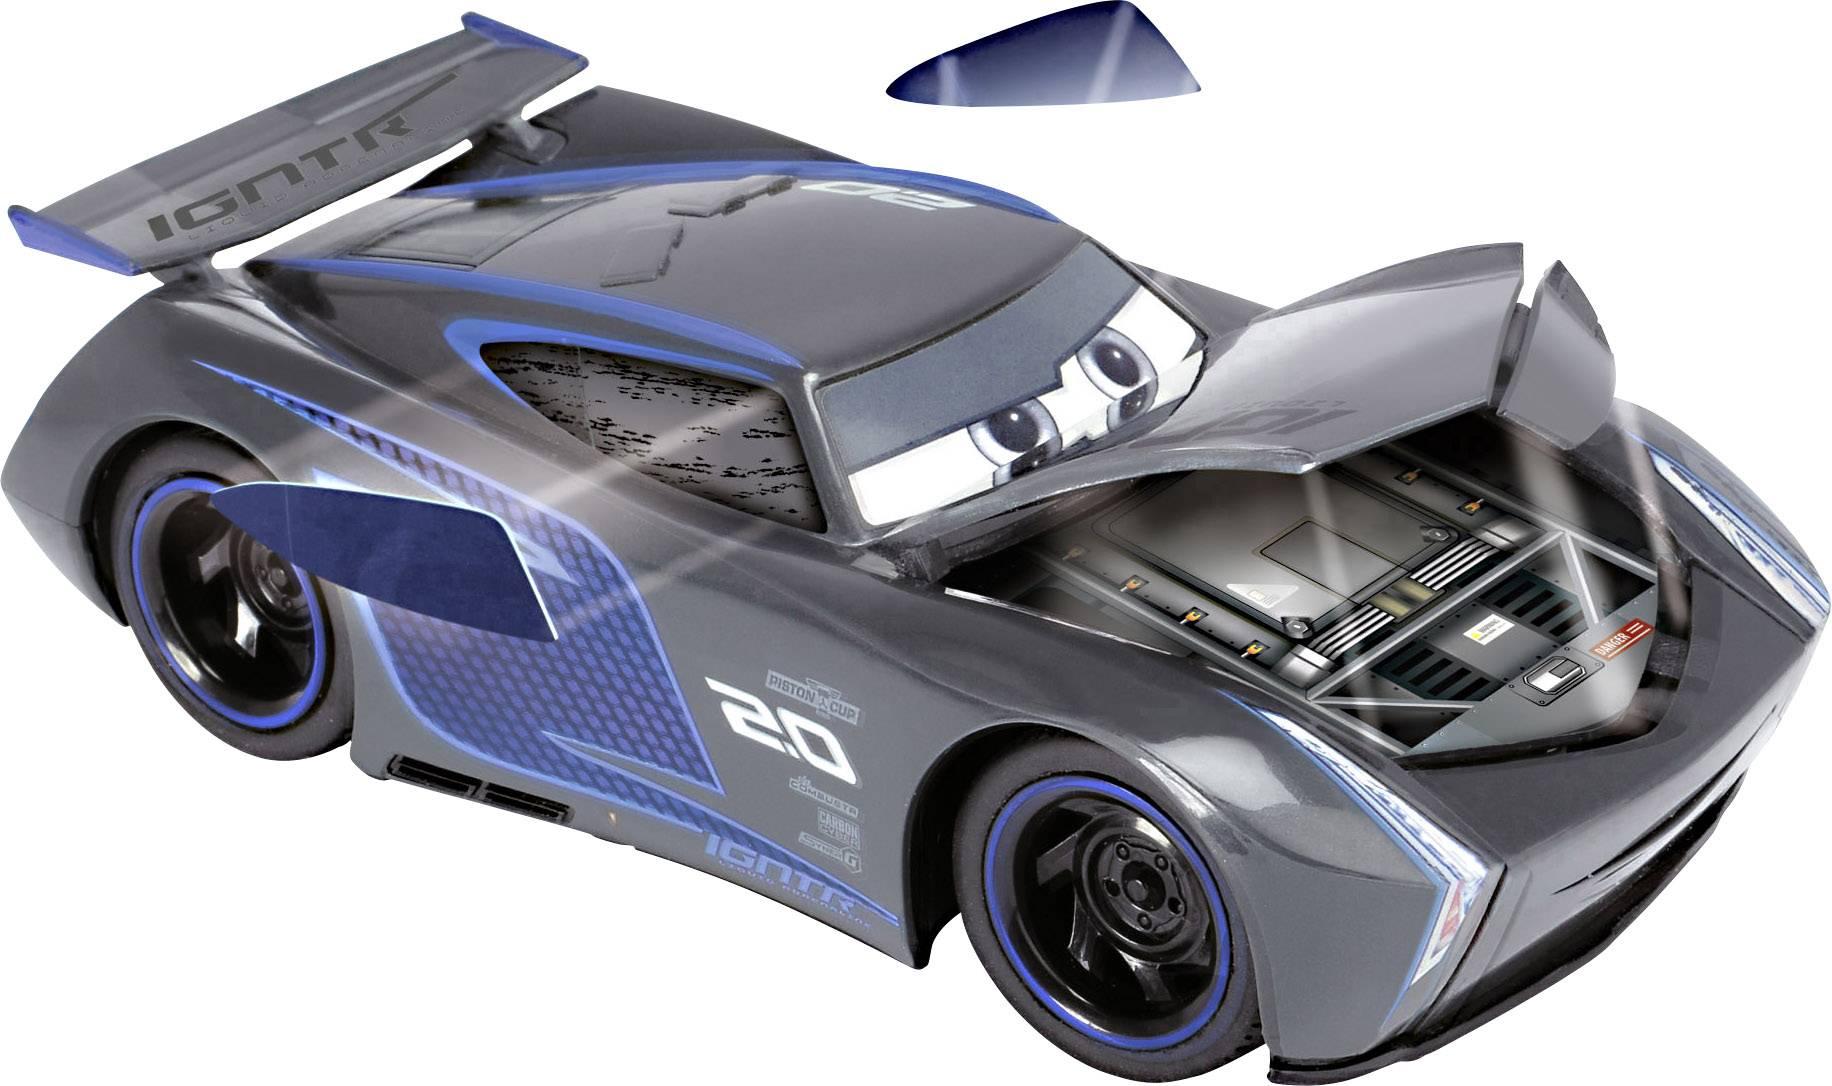 Dickie Toys 203084019 RC Cars 3 JS Crazy Crash 1:24 RC Einsteiger Modellauto Elektro Straßenmodell